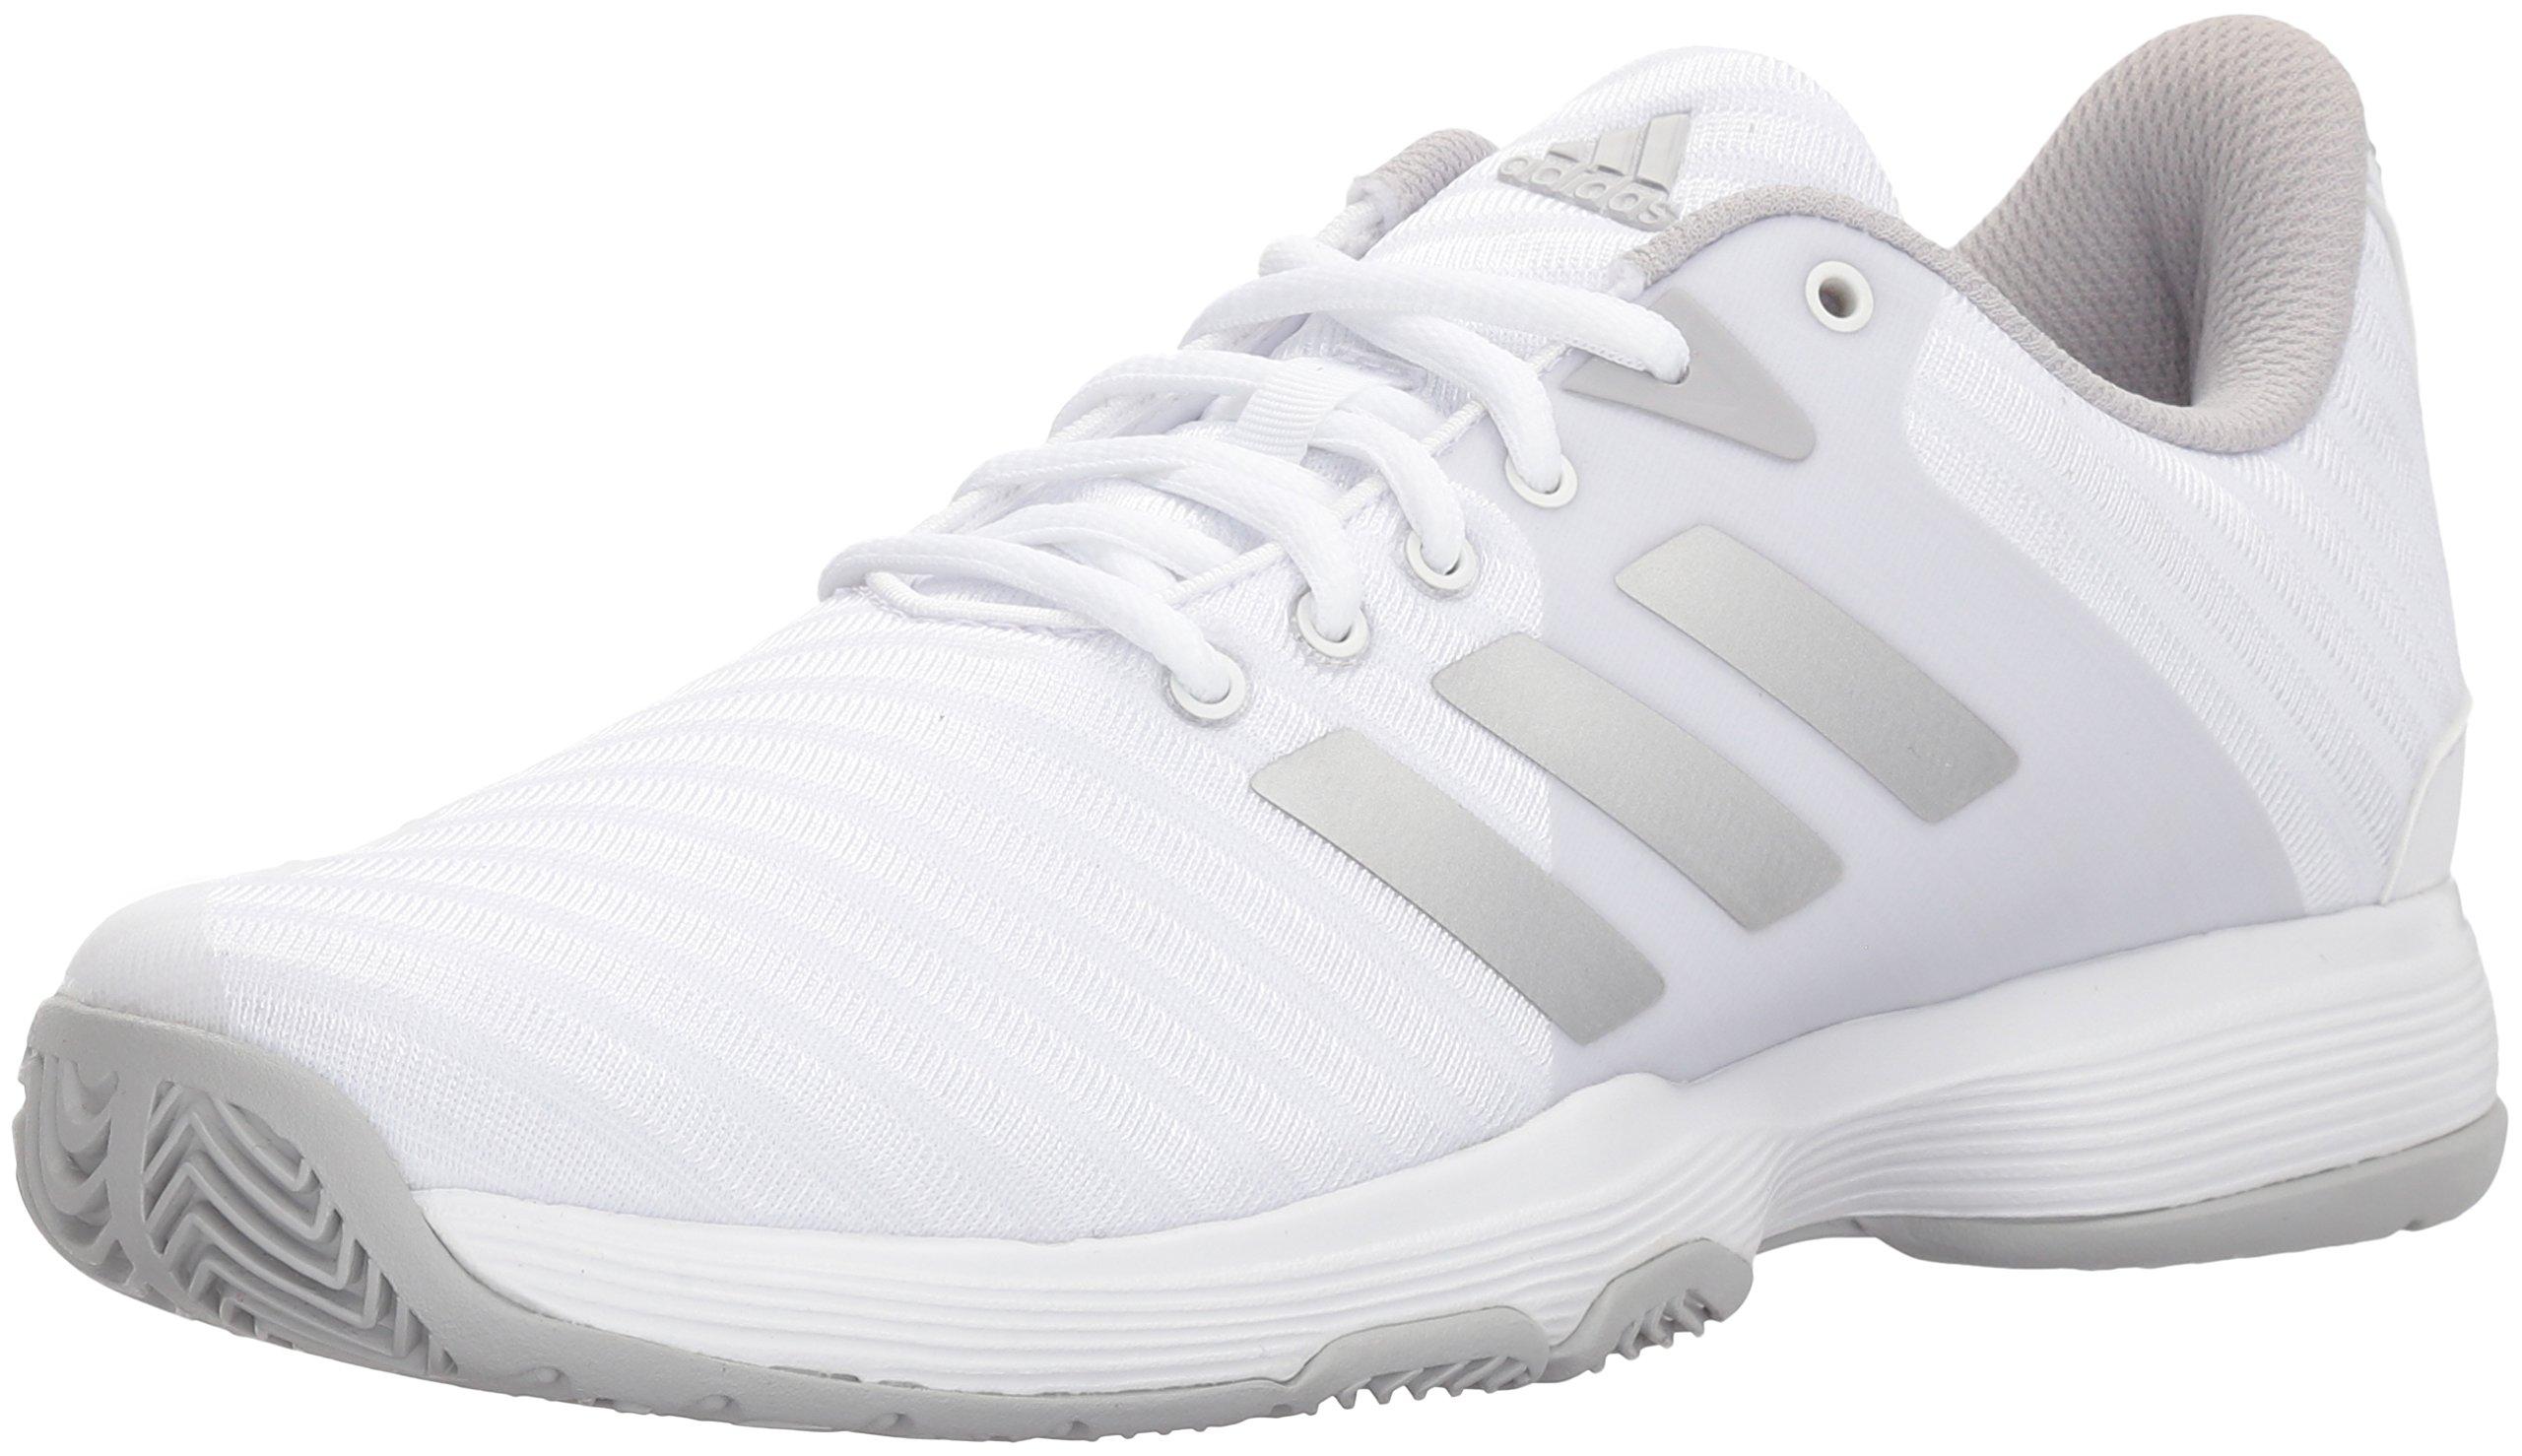 adidas Performance Women's Barricade Court w Tennis Shoe, White/Matte Silver/Grey, 8 M US